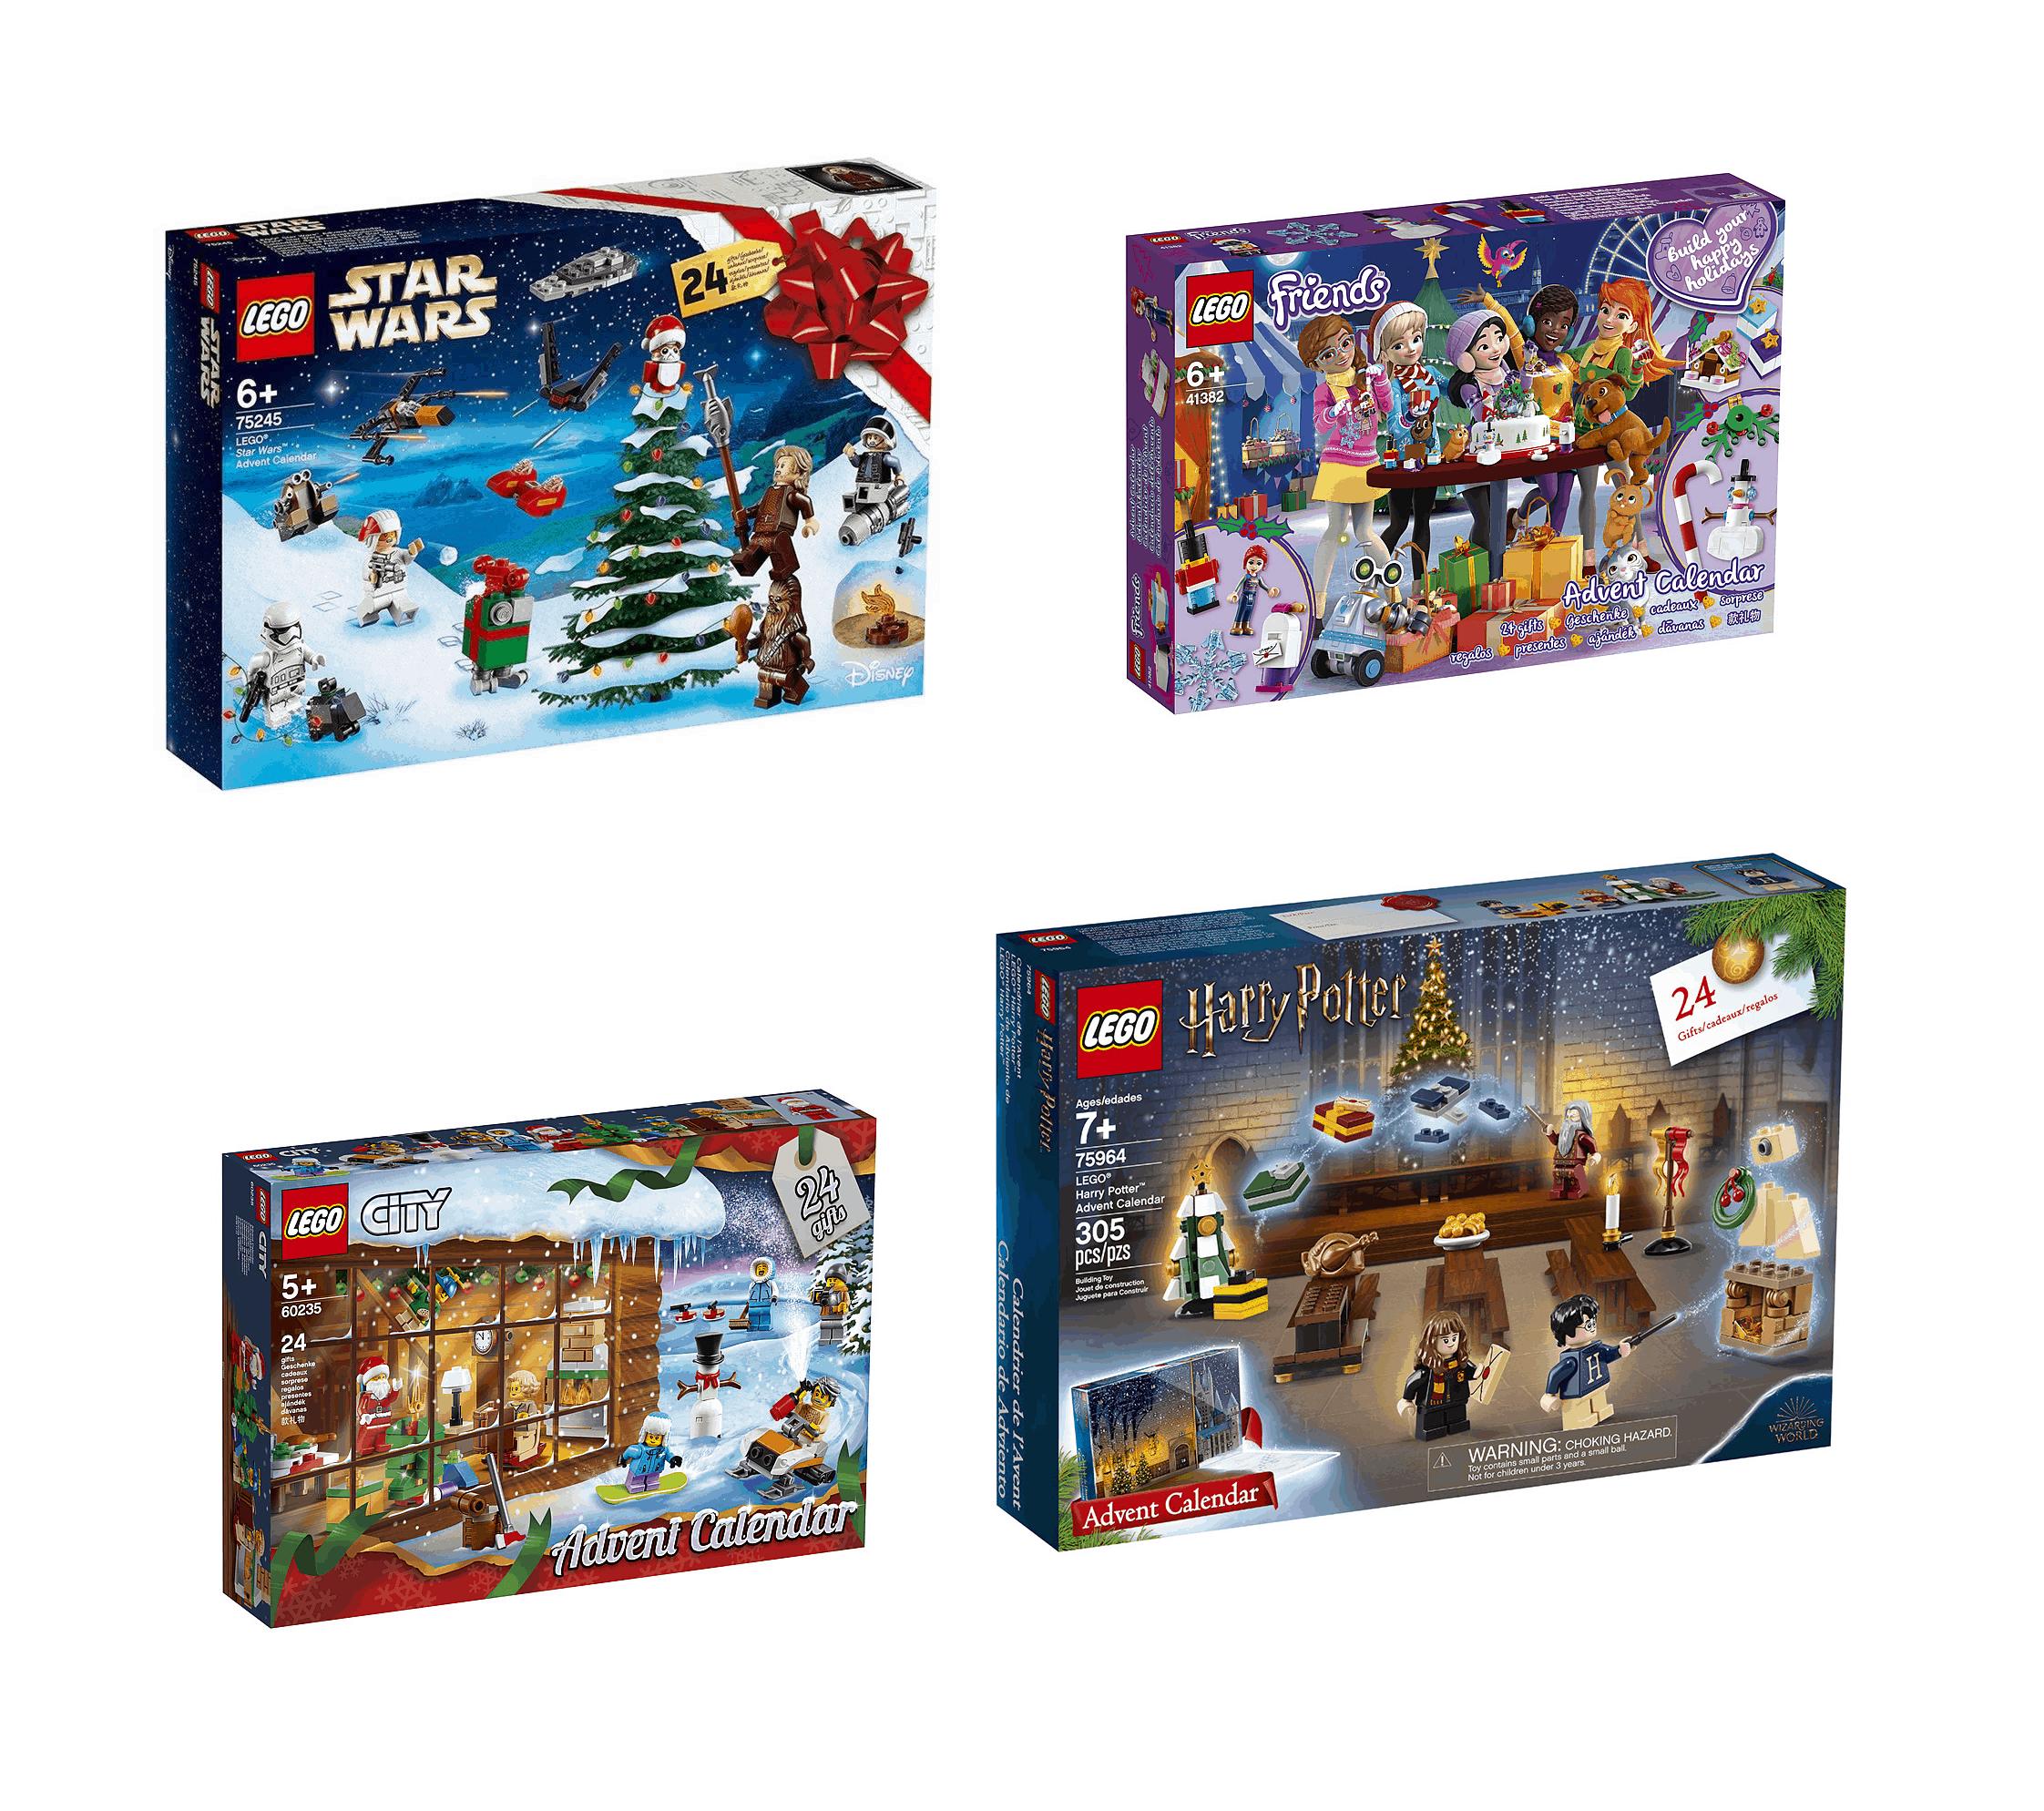 2019 Lego Advent Calendars Coming Soon Full Spoilers Hello Subscription Lego Advent Calendar Lego Advent Harry Potter Advent Calendar